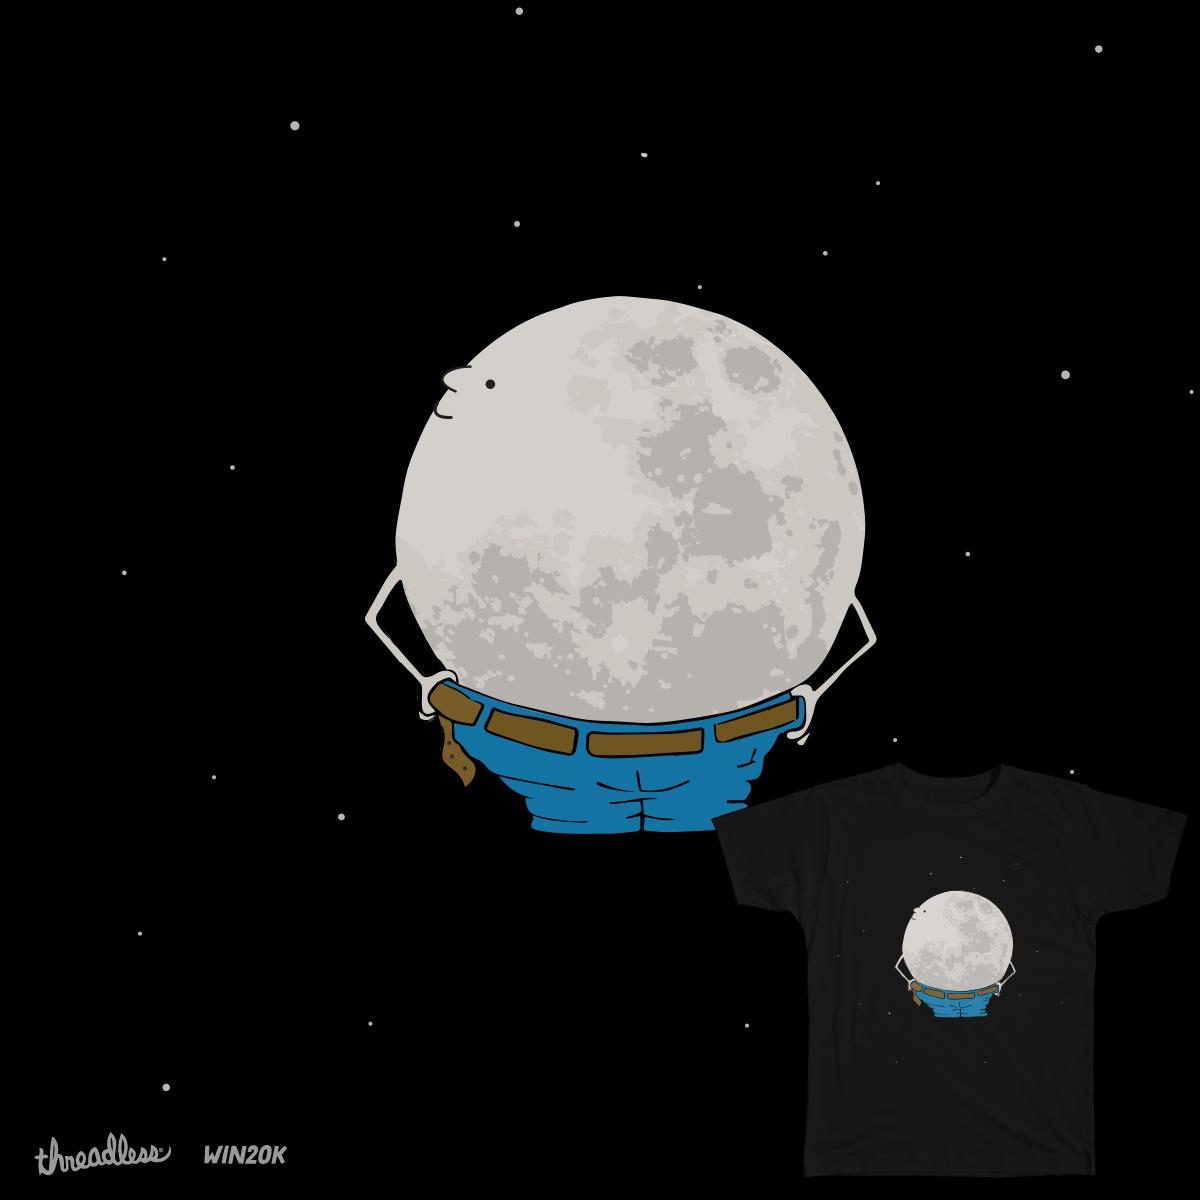 Full Moon by Vmorelli on Threadless